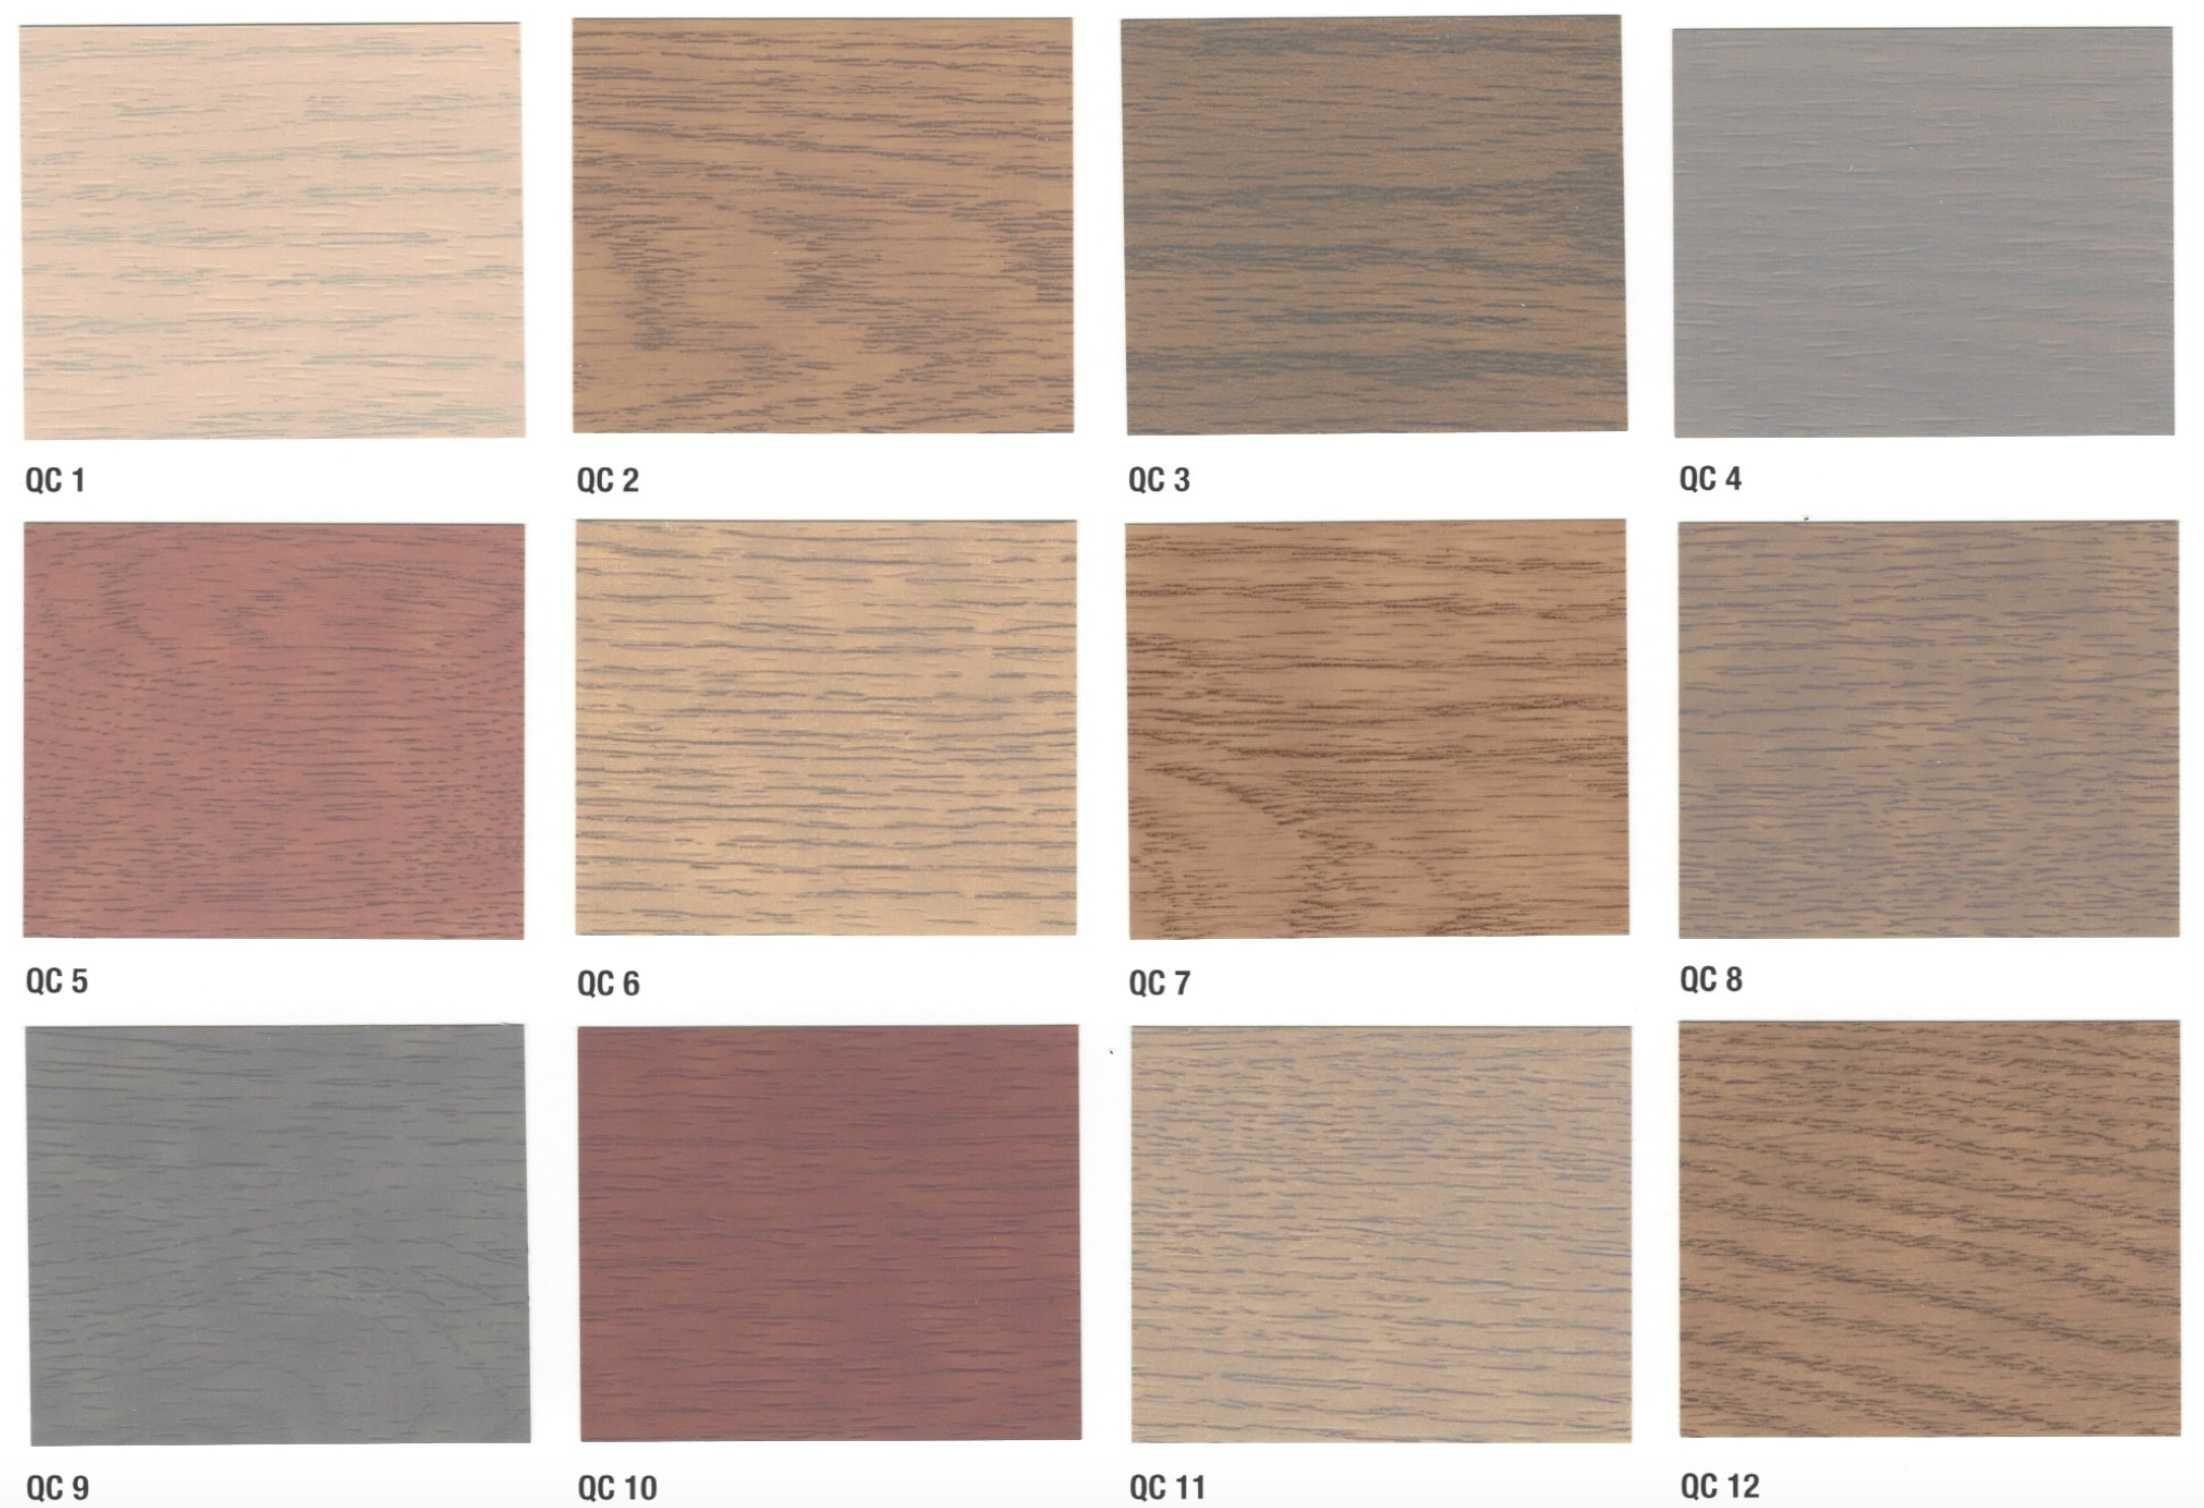 Duraseal Hardwood Floor Stain Colors Httpwww